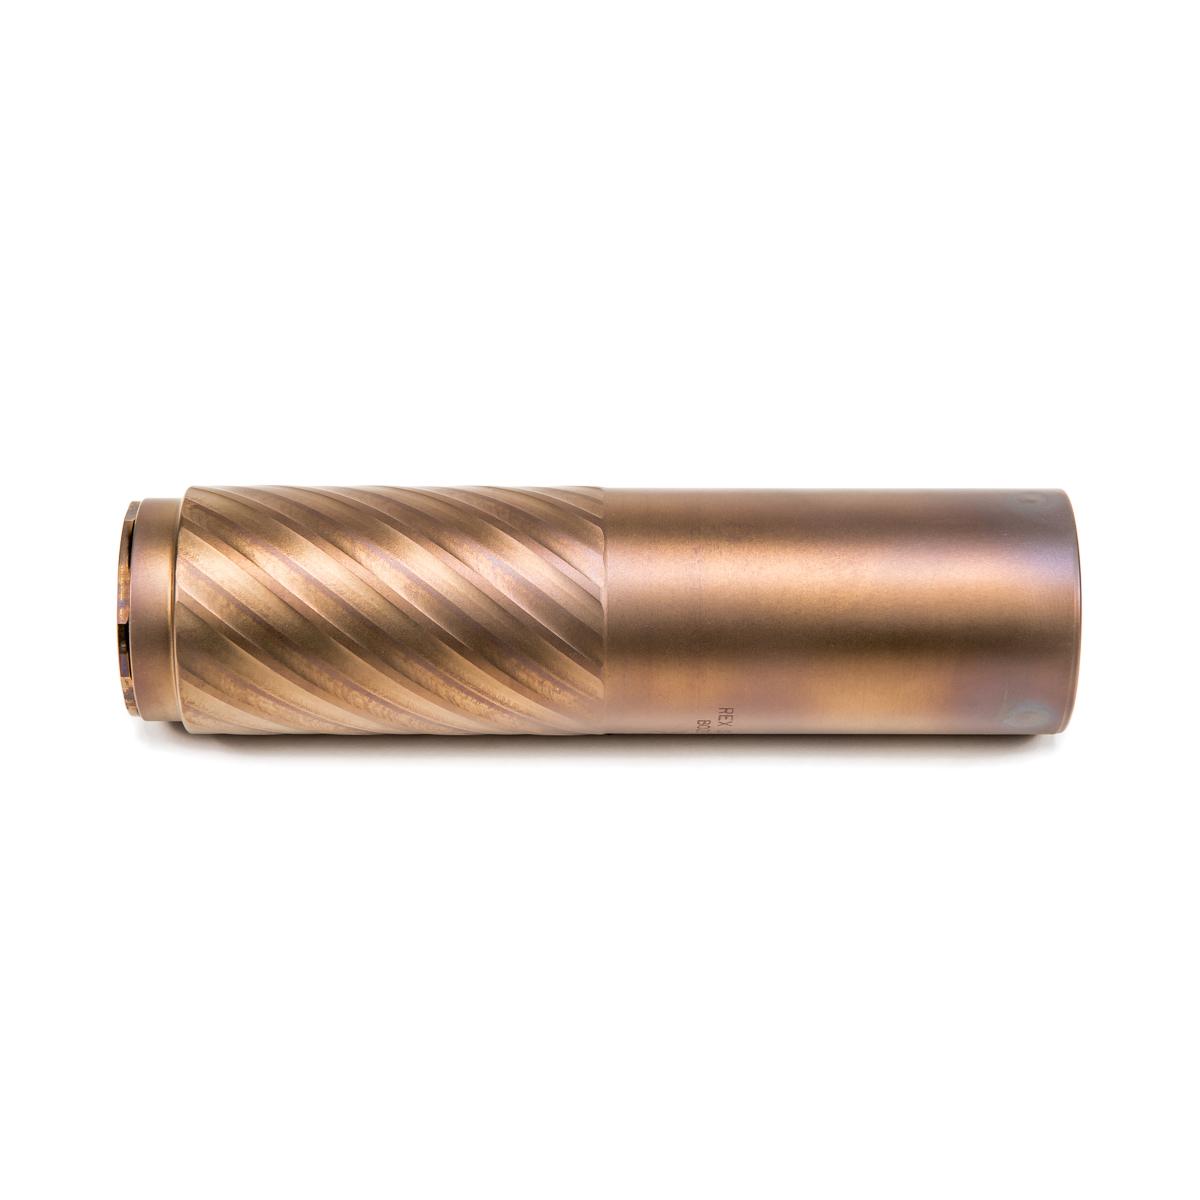 VIRIBUS GEN3 7.62mm 300 MAGNUM Rifle Suppressor (6.6in Long) VIR300-G3